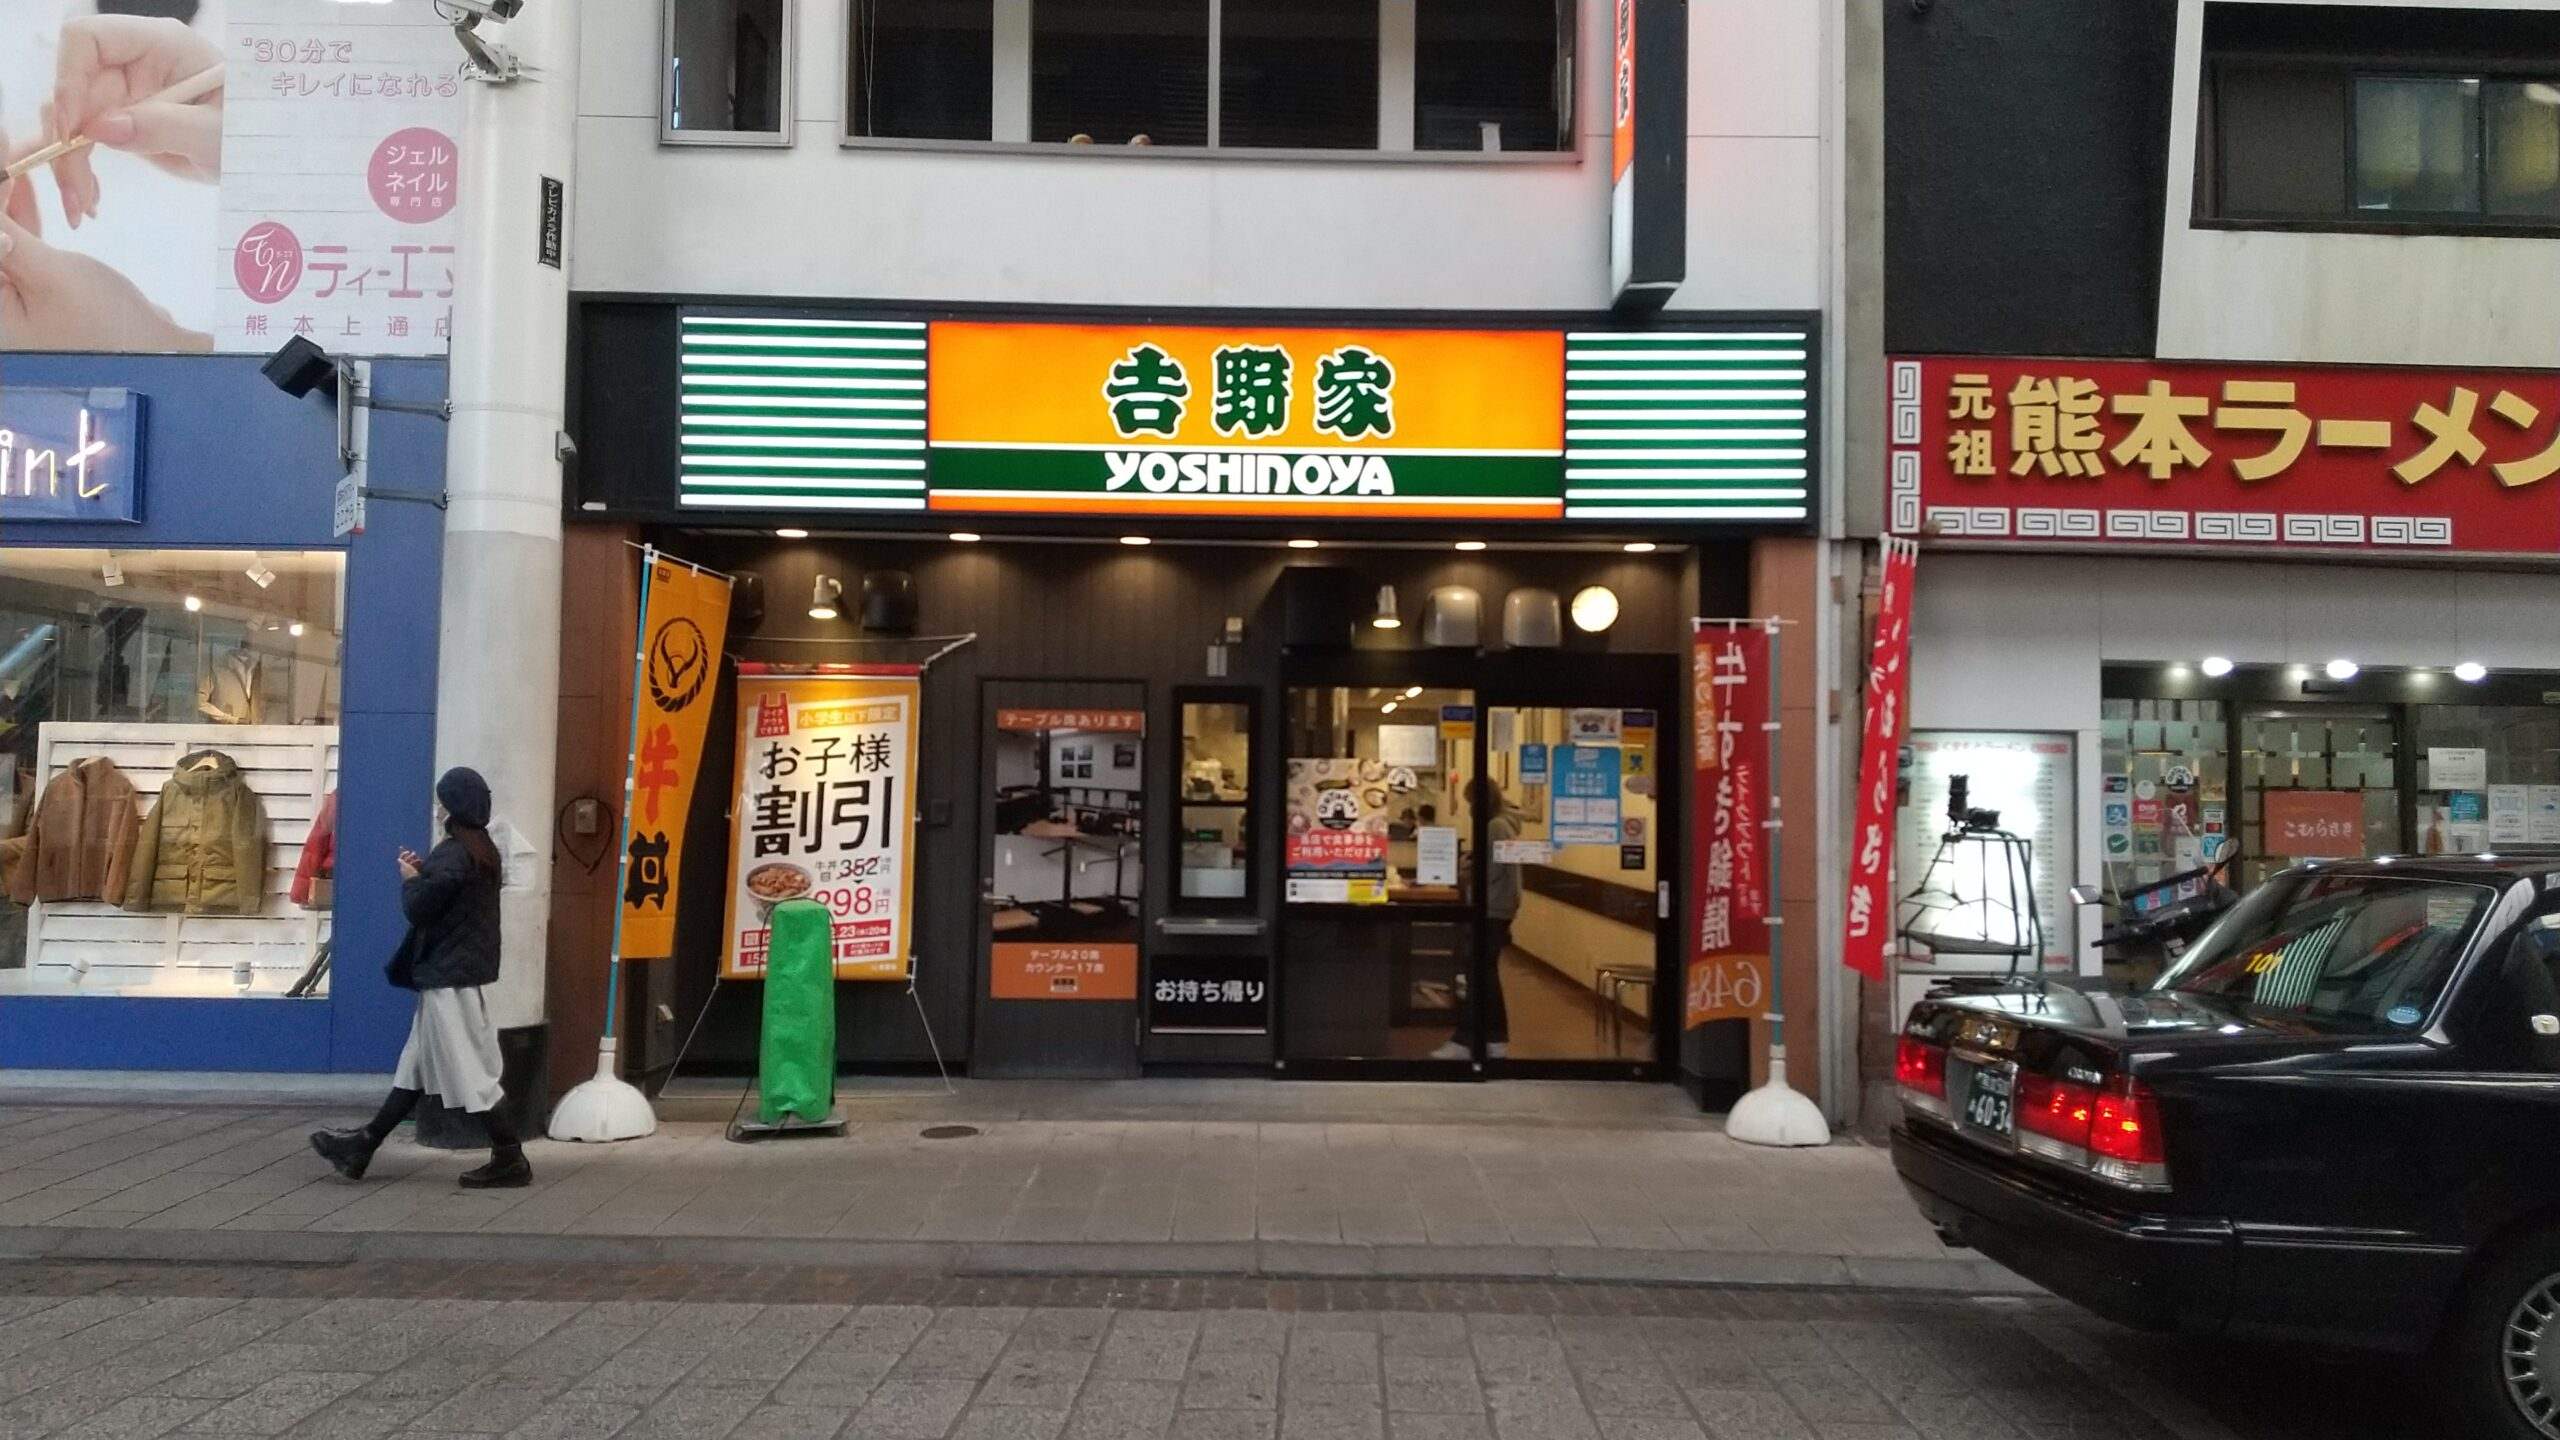 吉野家 熊本上通り店